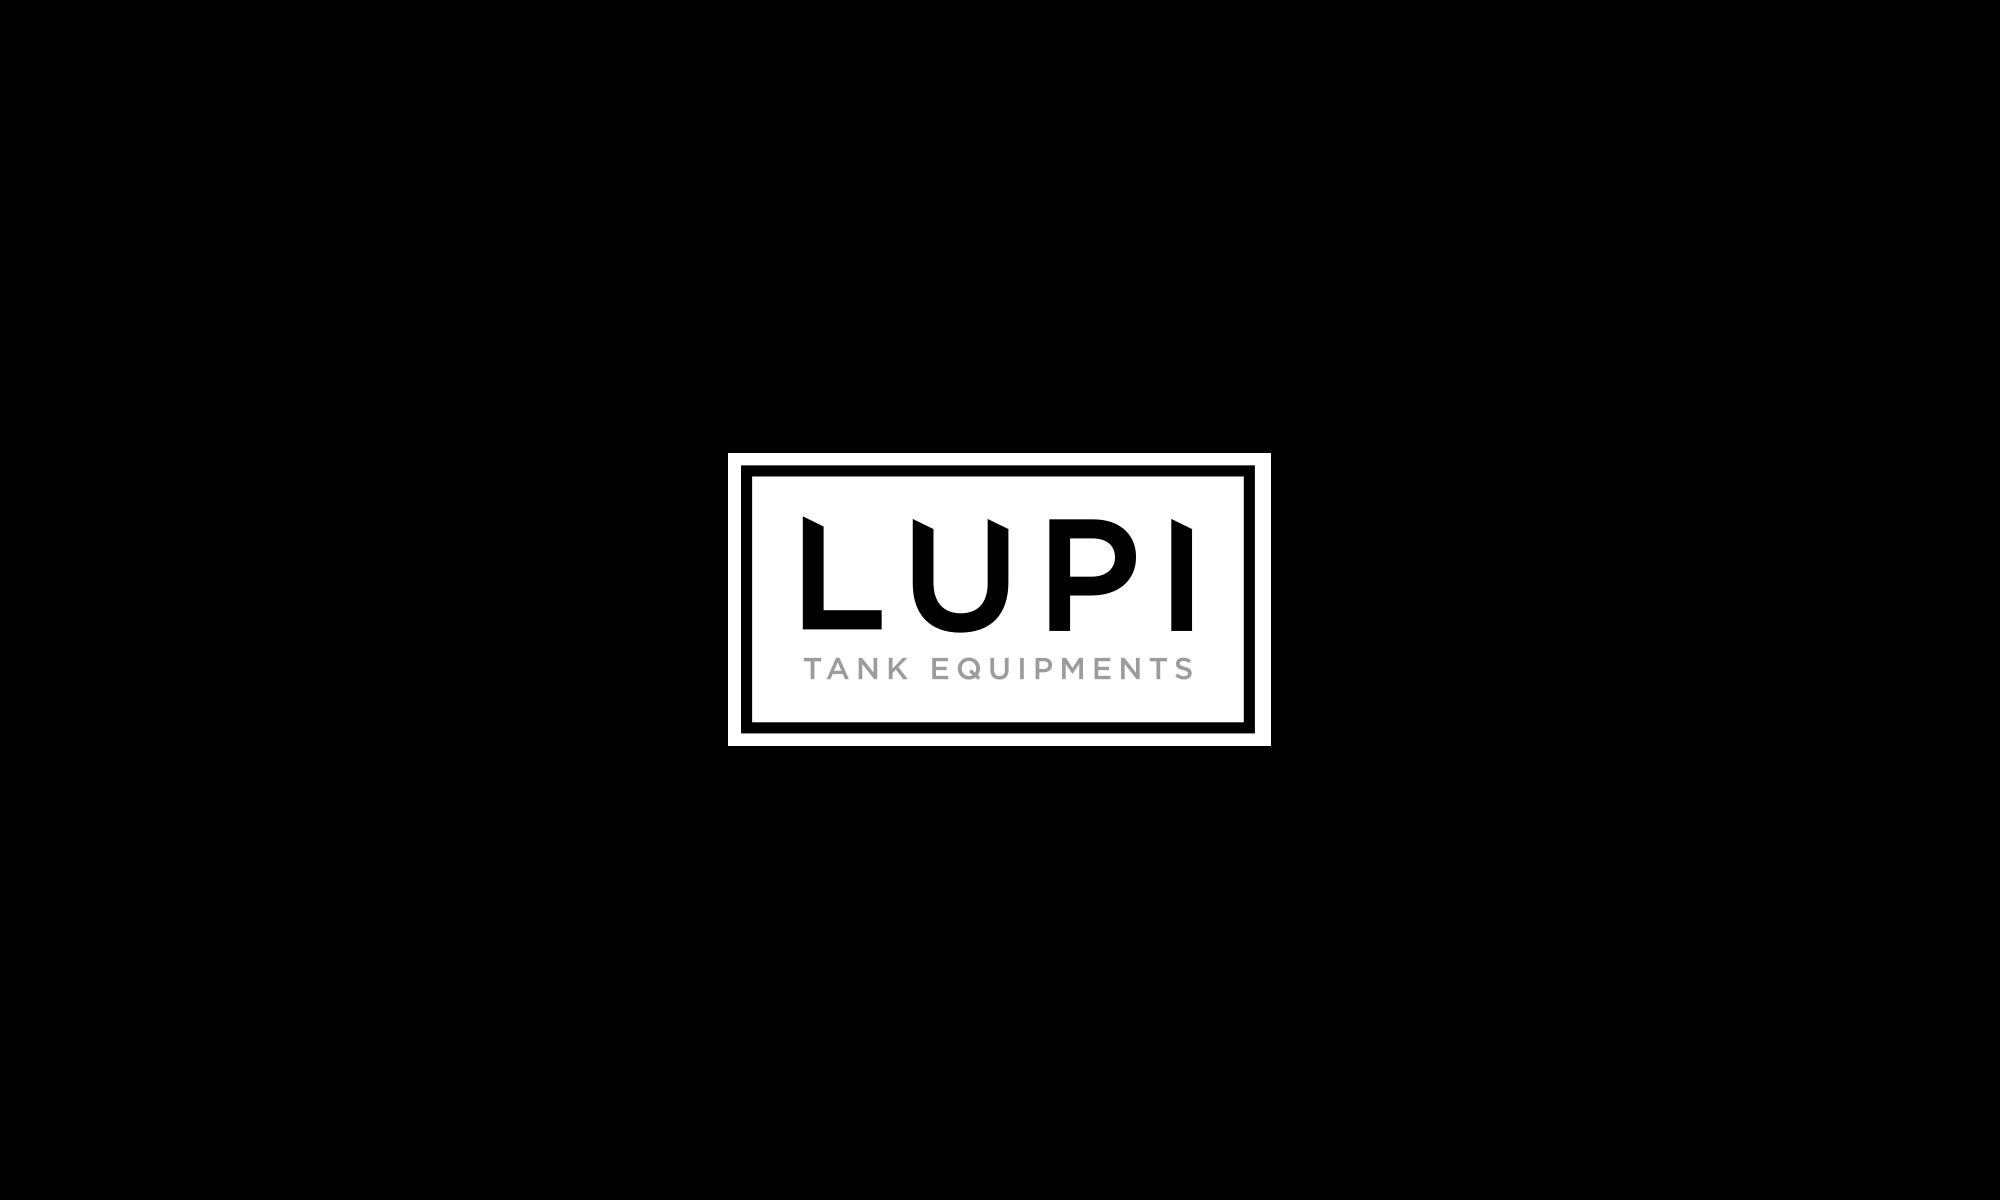 Lupi Tank Equipments srls